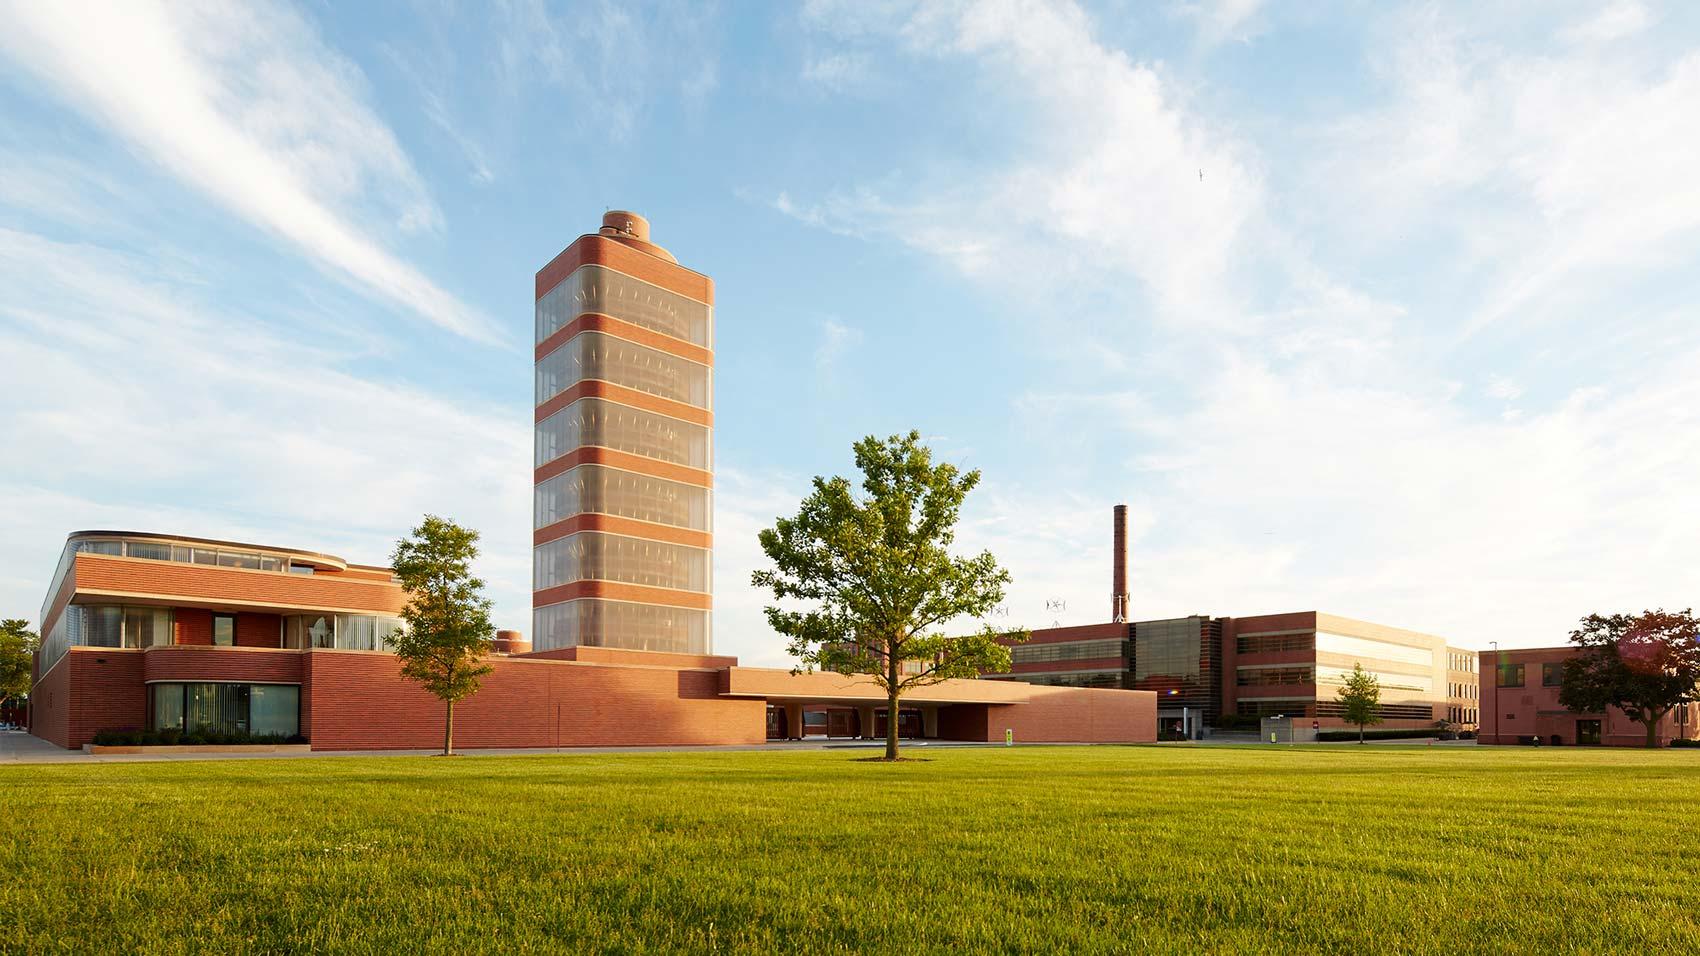 SC Johnson headquarters campus in Racine, Wisconsin